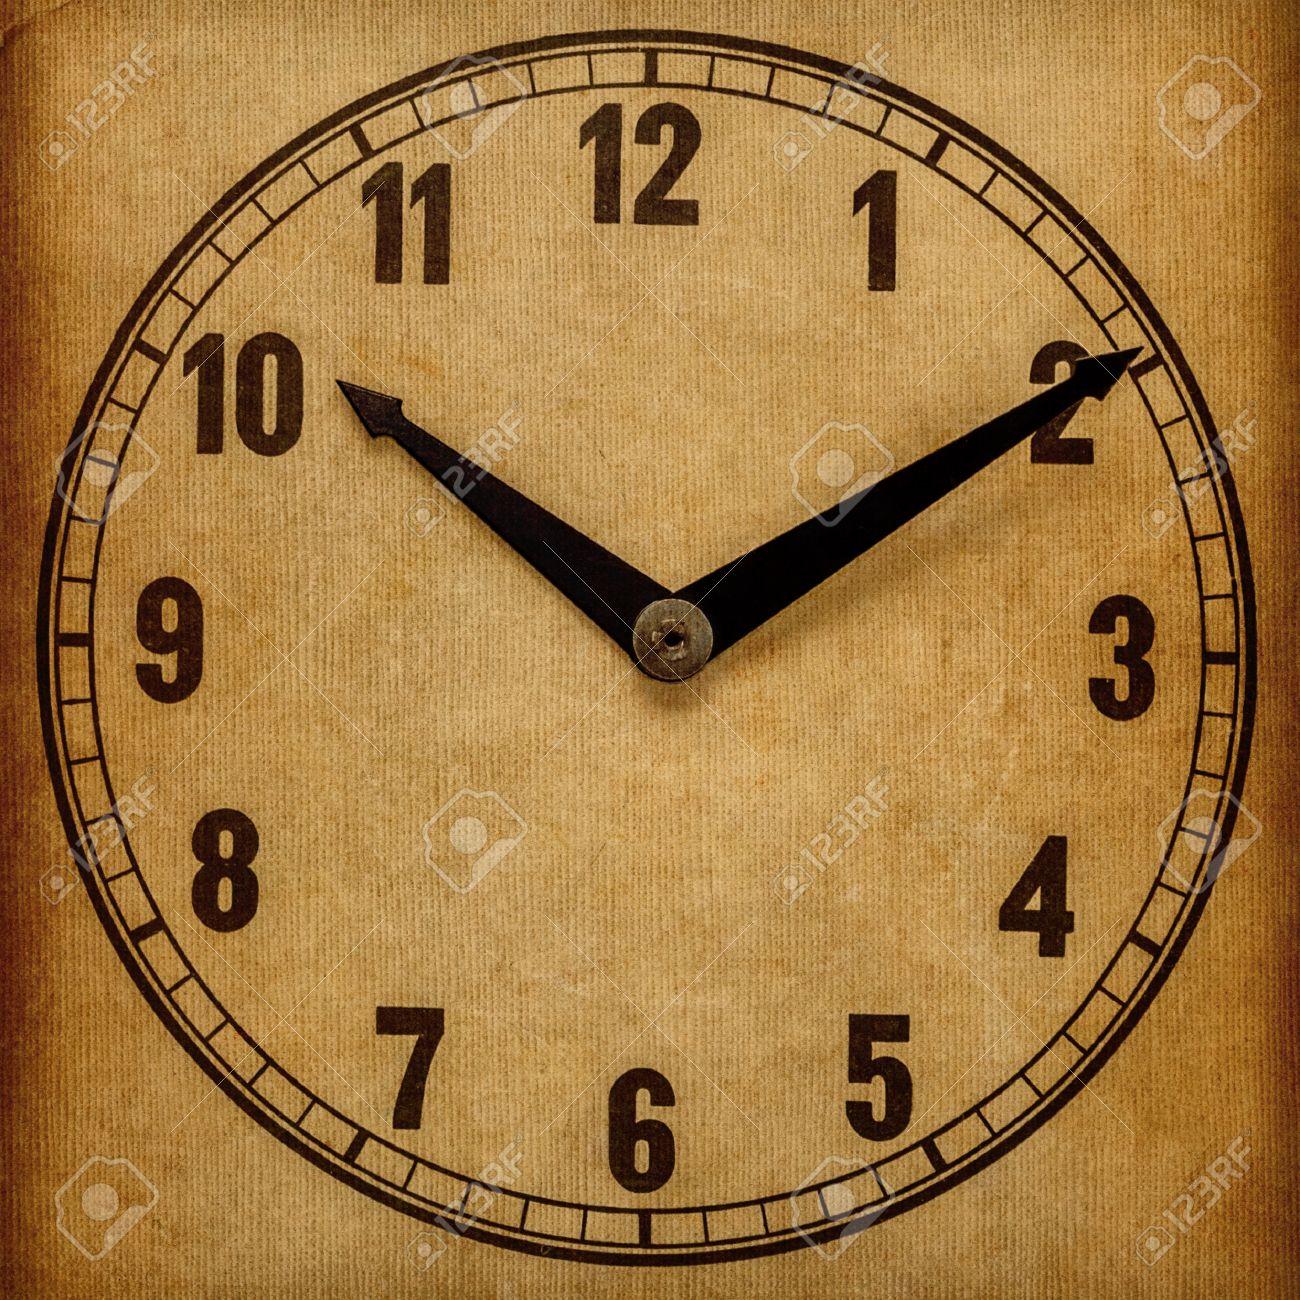 Clock Face Showing 12 O'clock Face Showing 5 O'clock